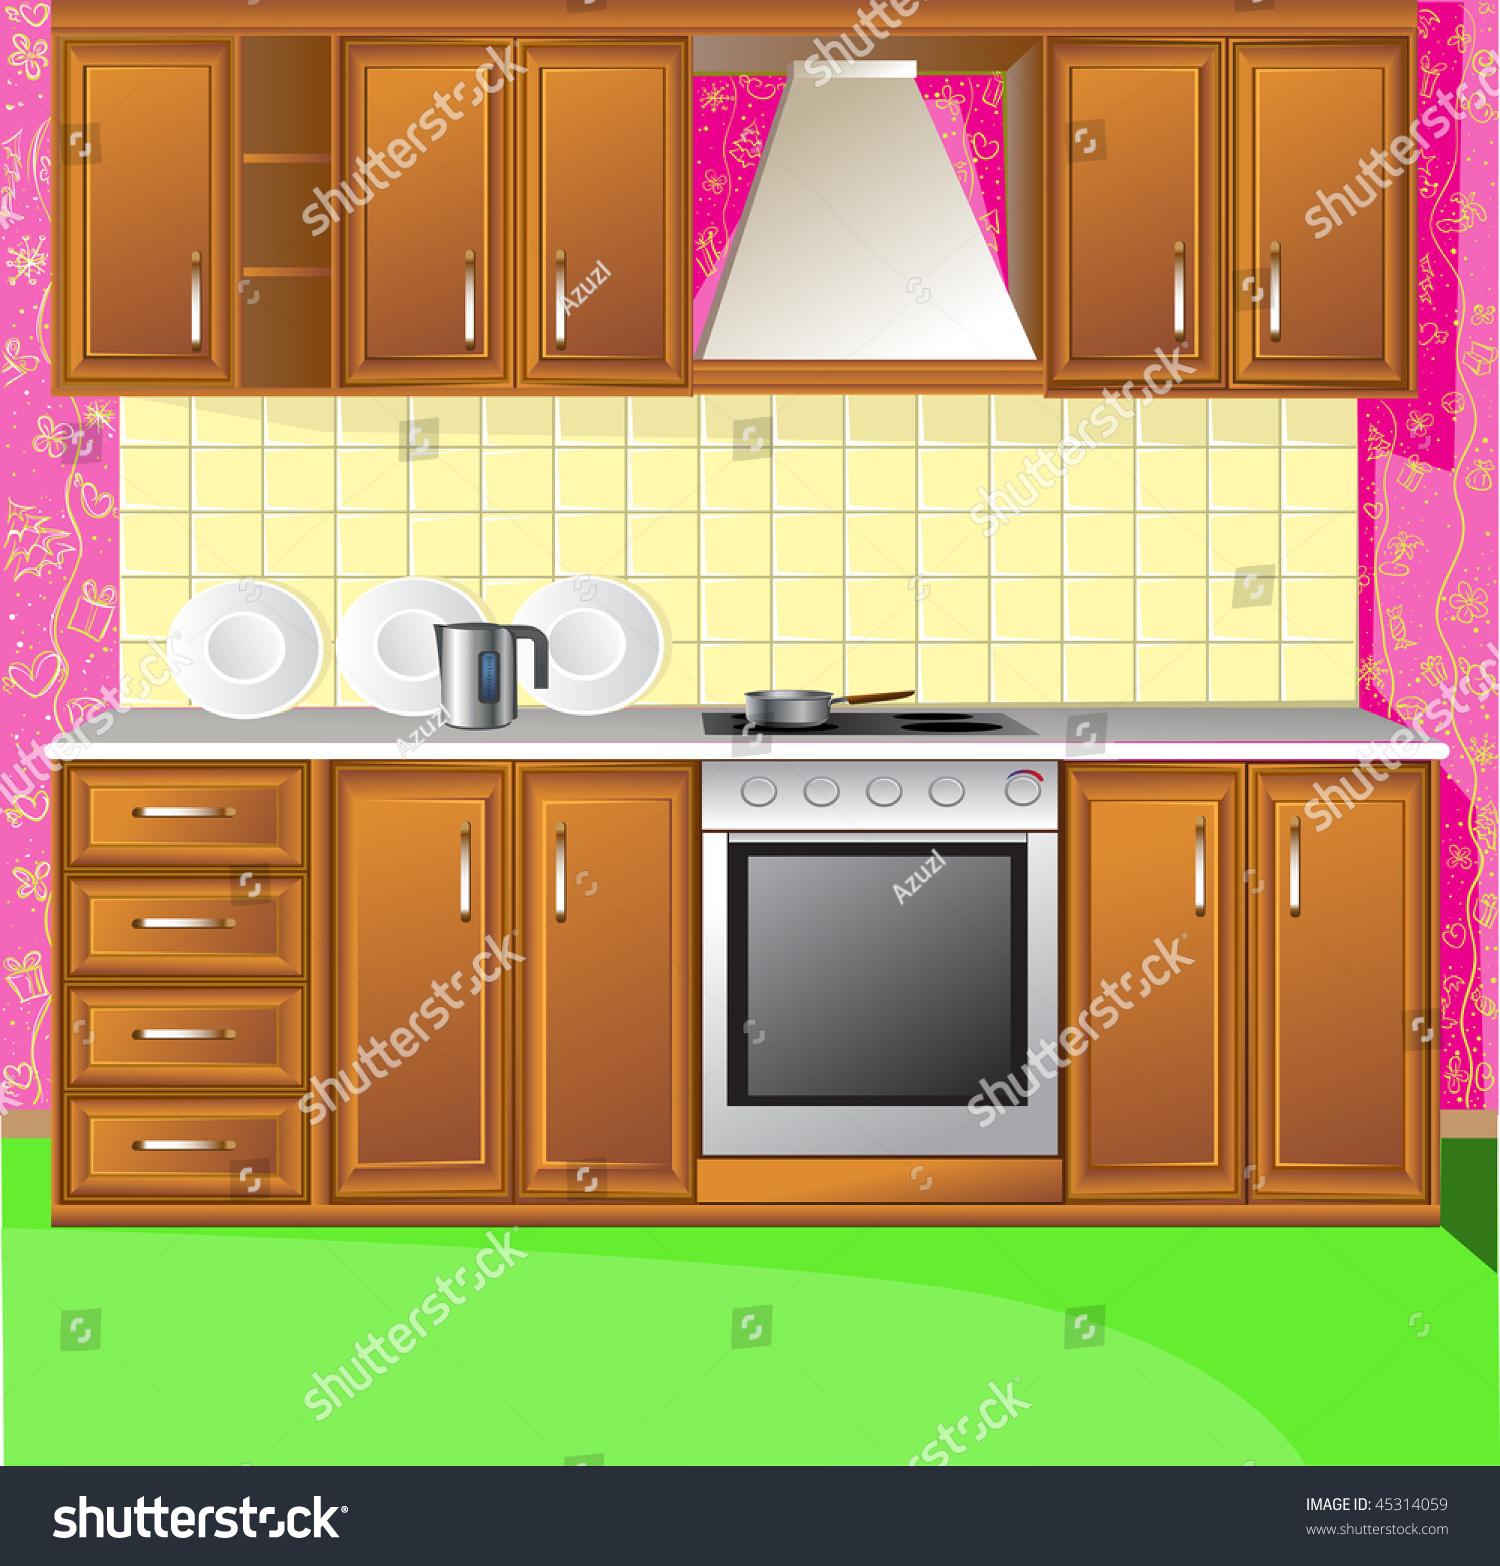 Light Pink Kitchen Vecor Stock Vector Illustration